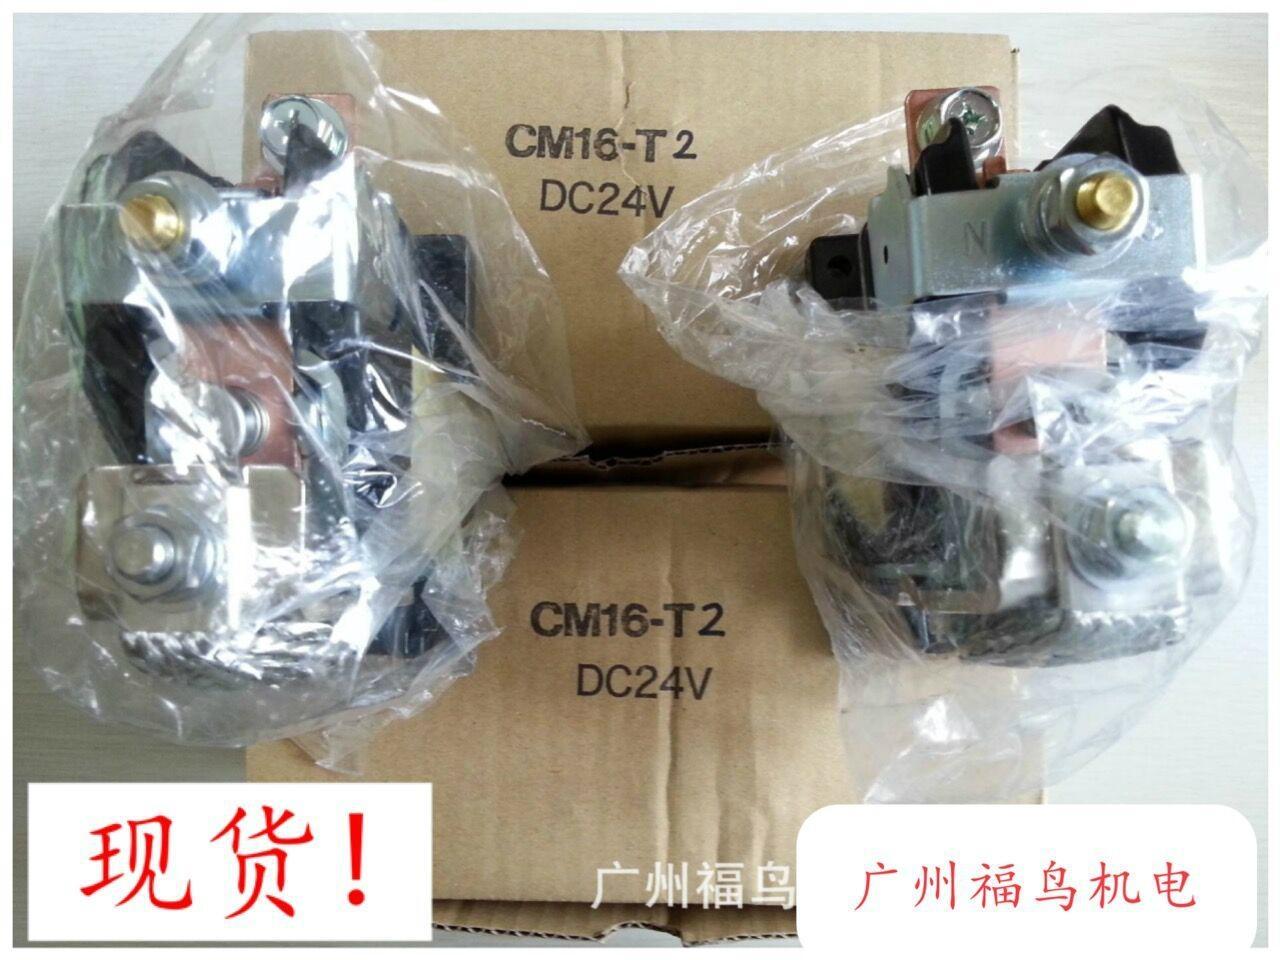 KYORITSU共立直流電磁接觸器, 型號: CM16-T2